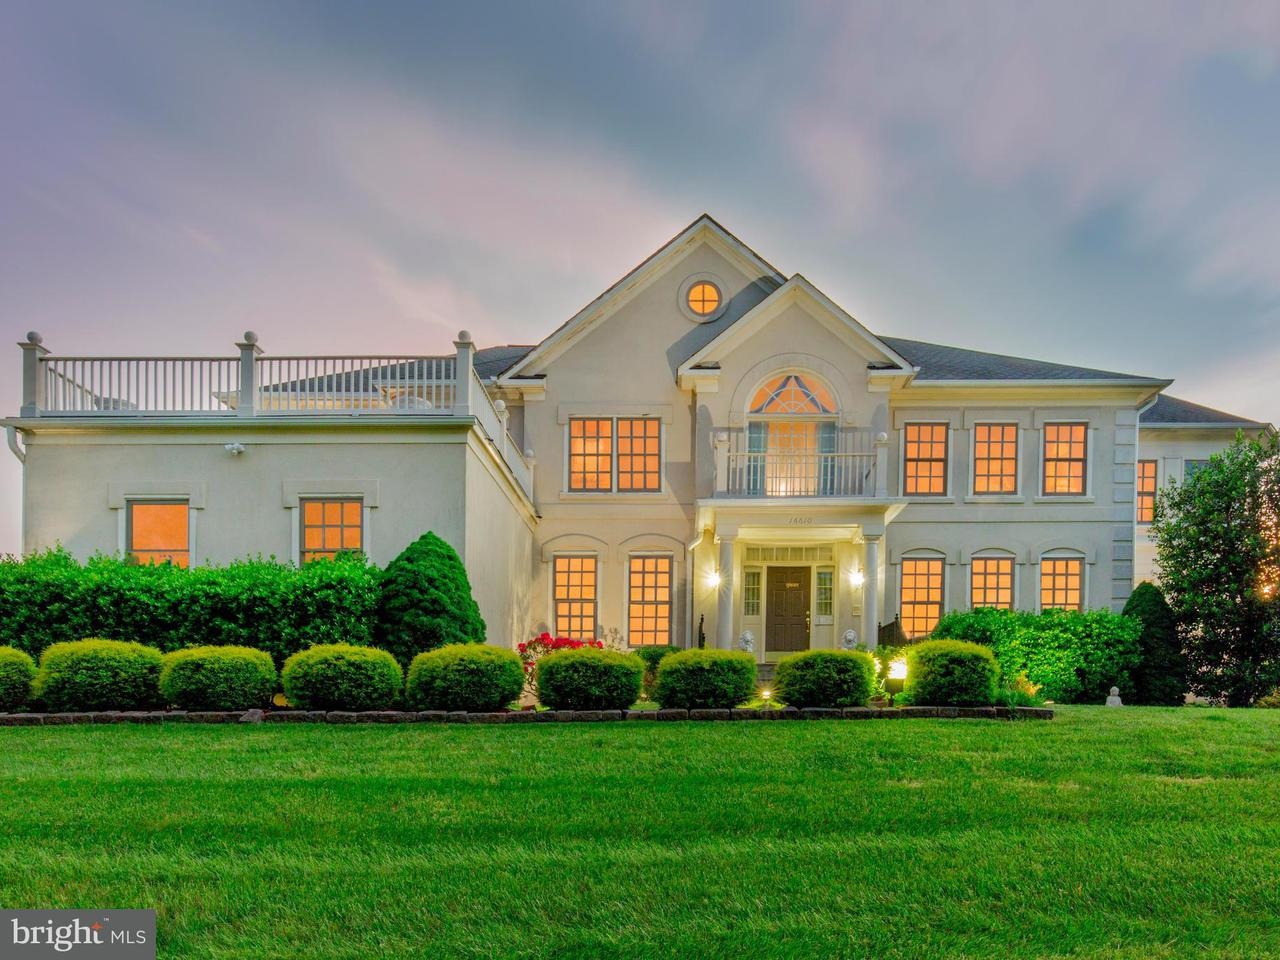 Single Family Home for Sale at 16610 SEA ISLAND Court 16610 SEA ISLAND Court Silver Spring, Maryland 20905 United States